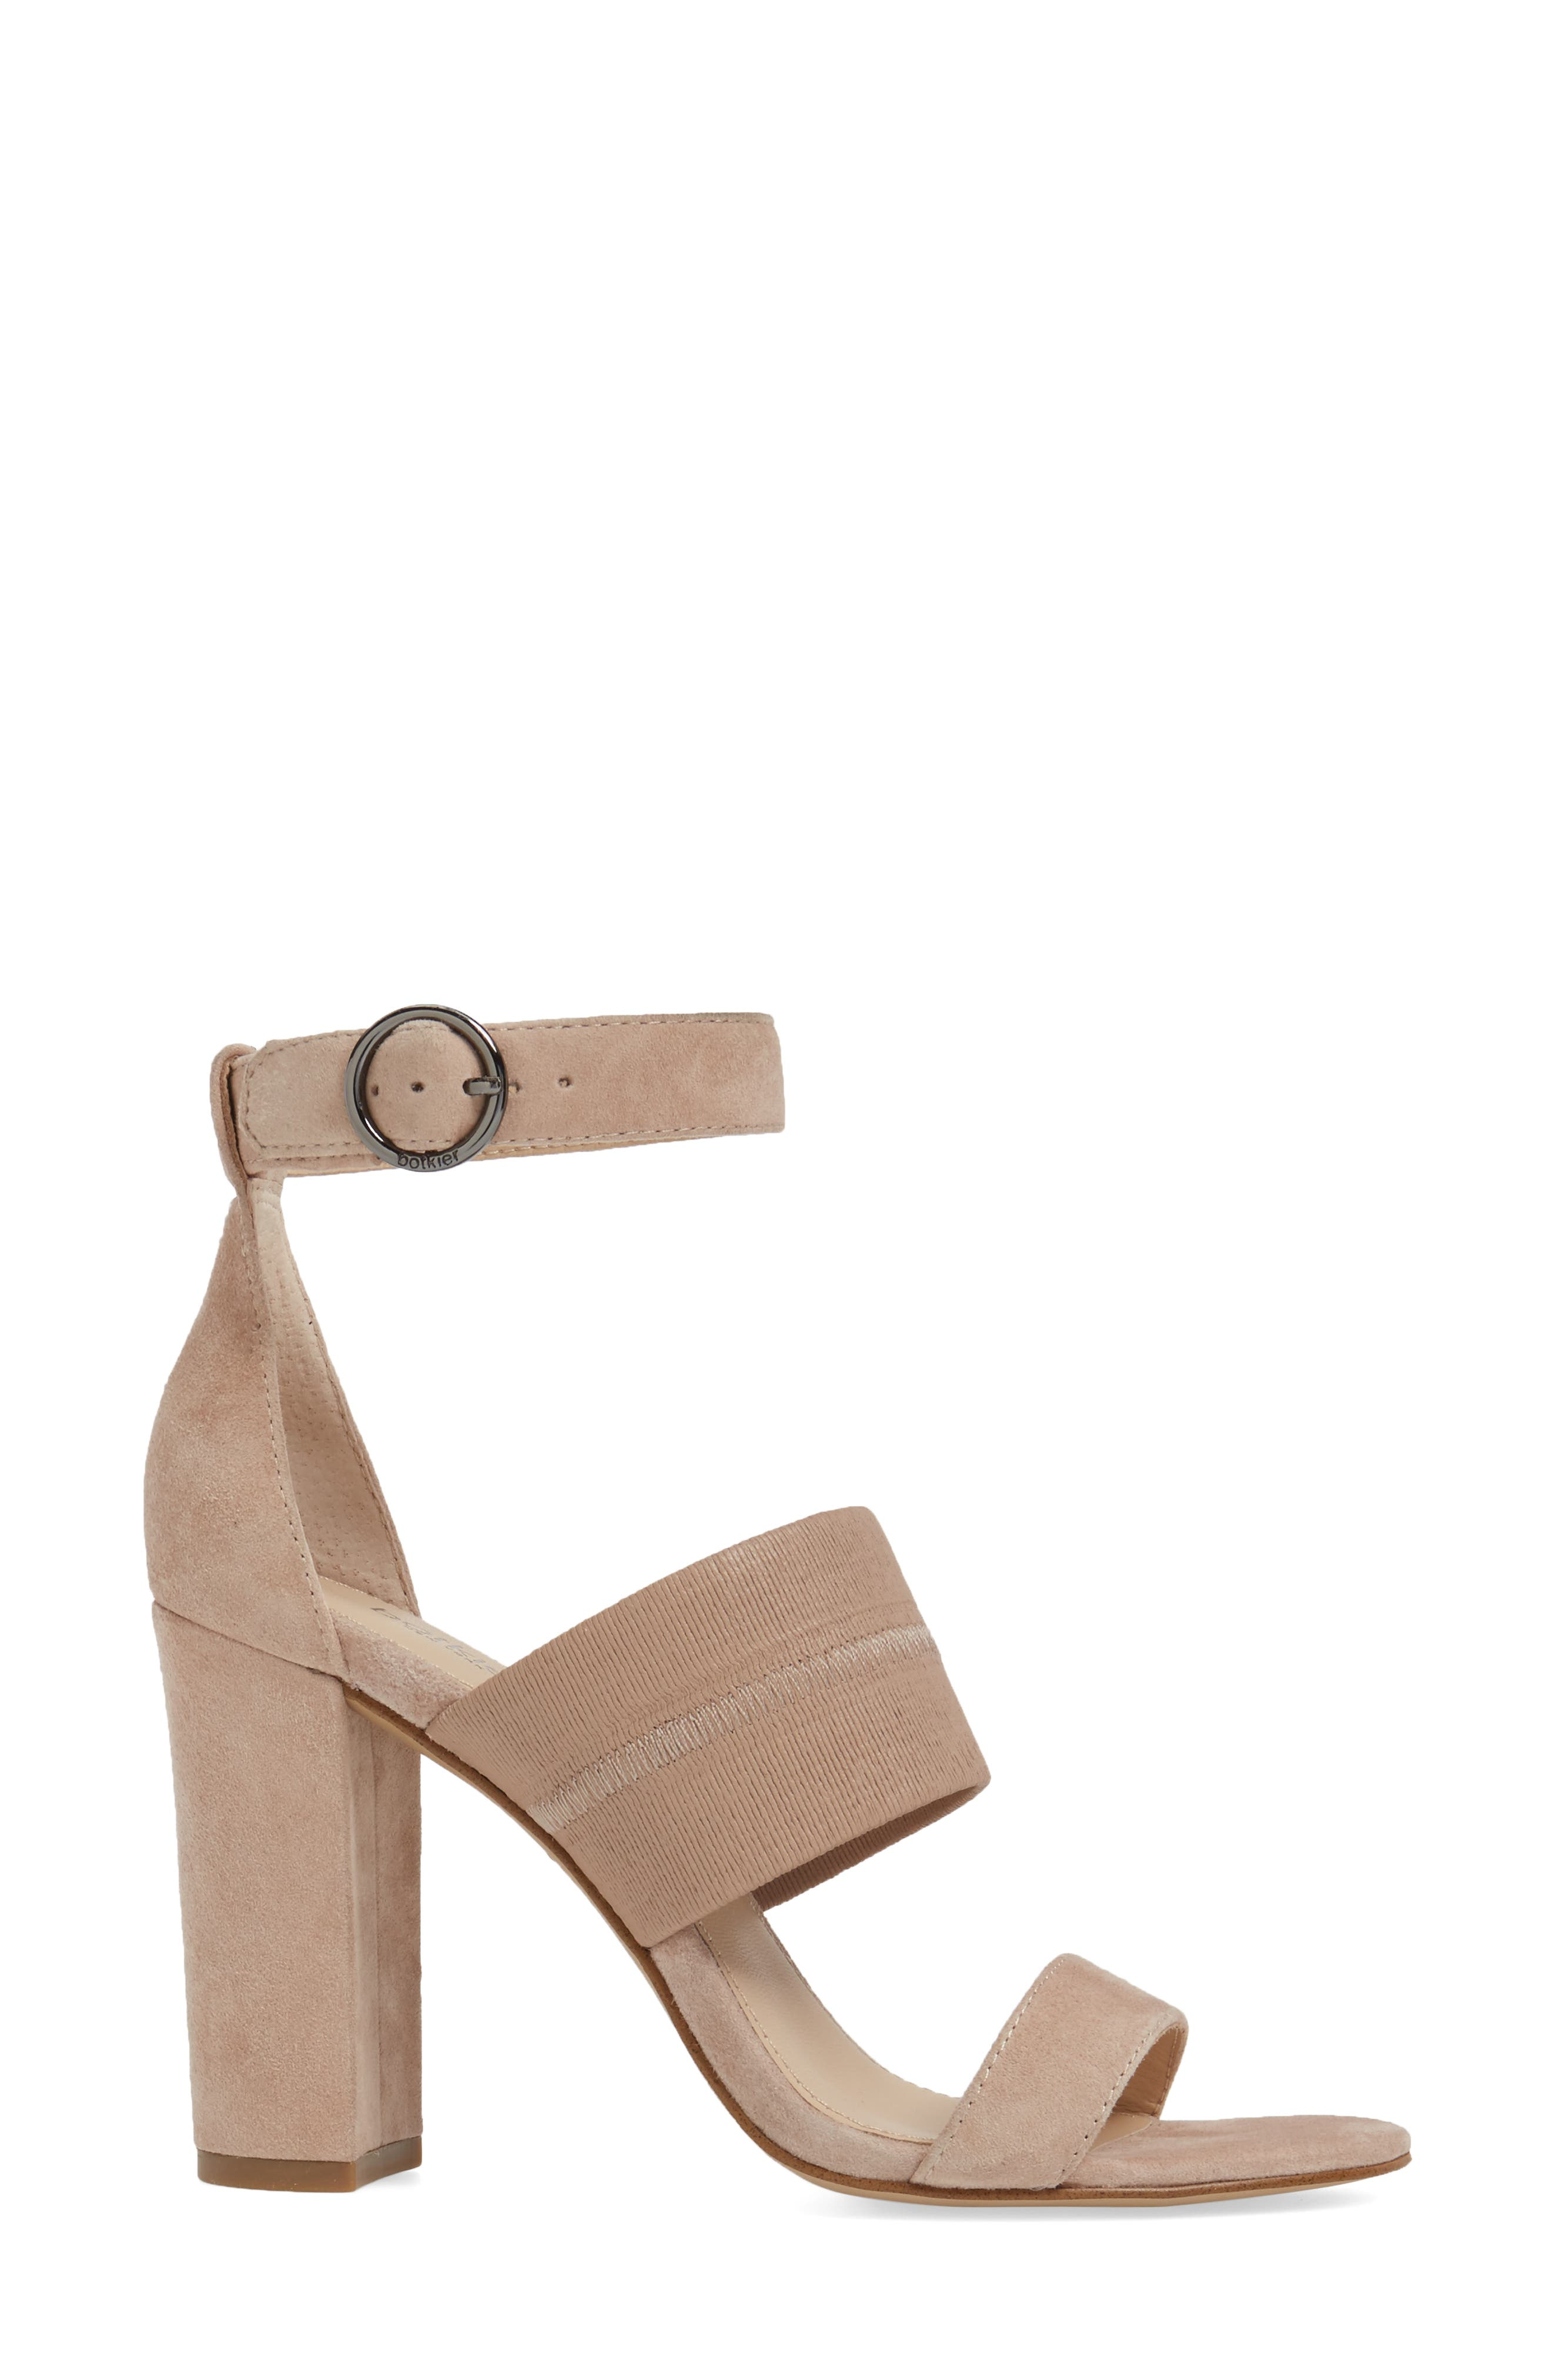 Gisella Ankle Strap Sandal,                             Alternate thumbnail 6, color,